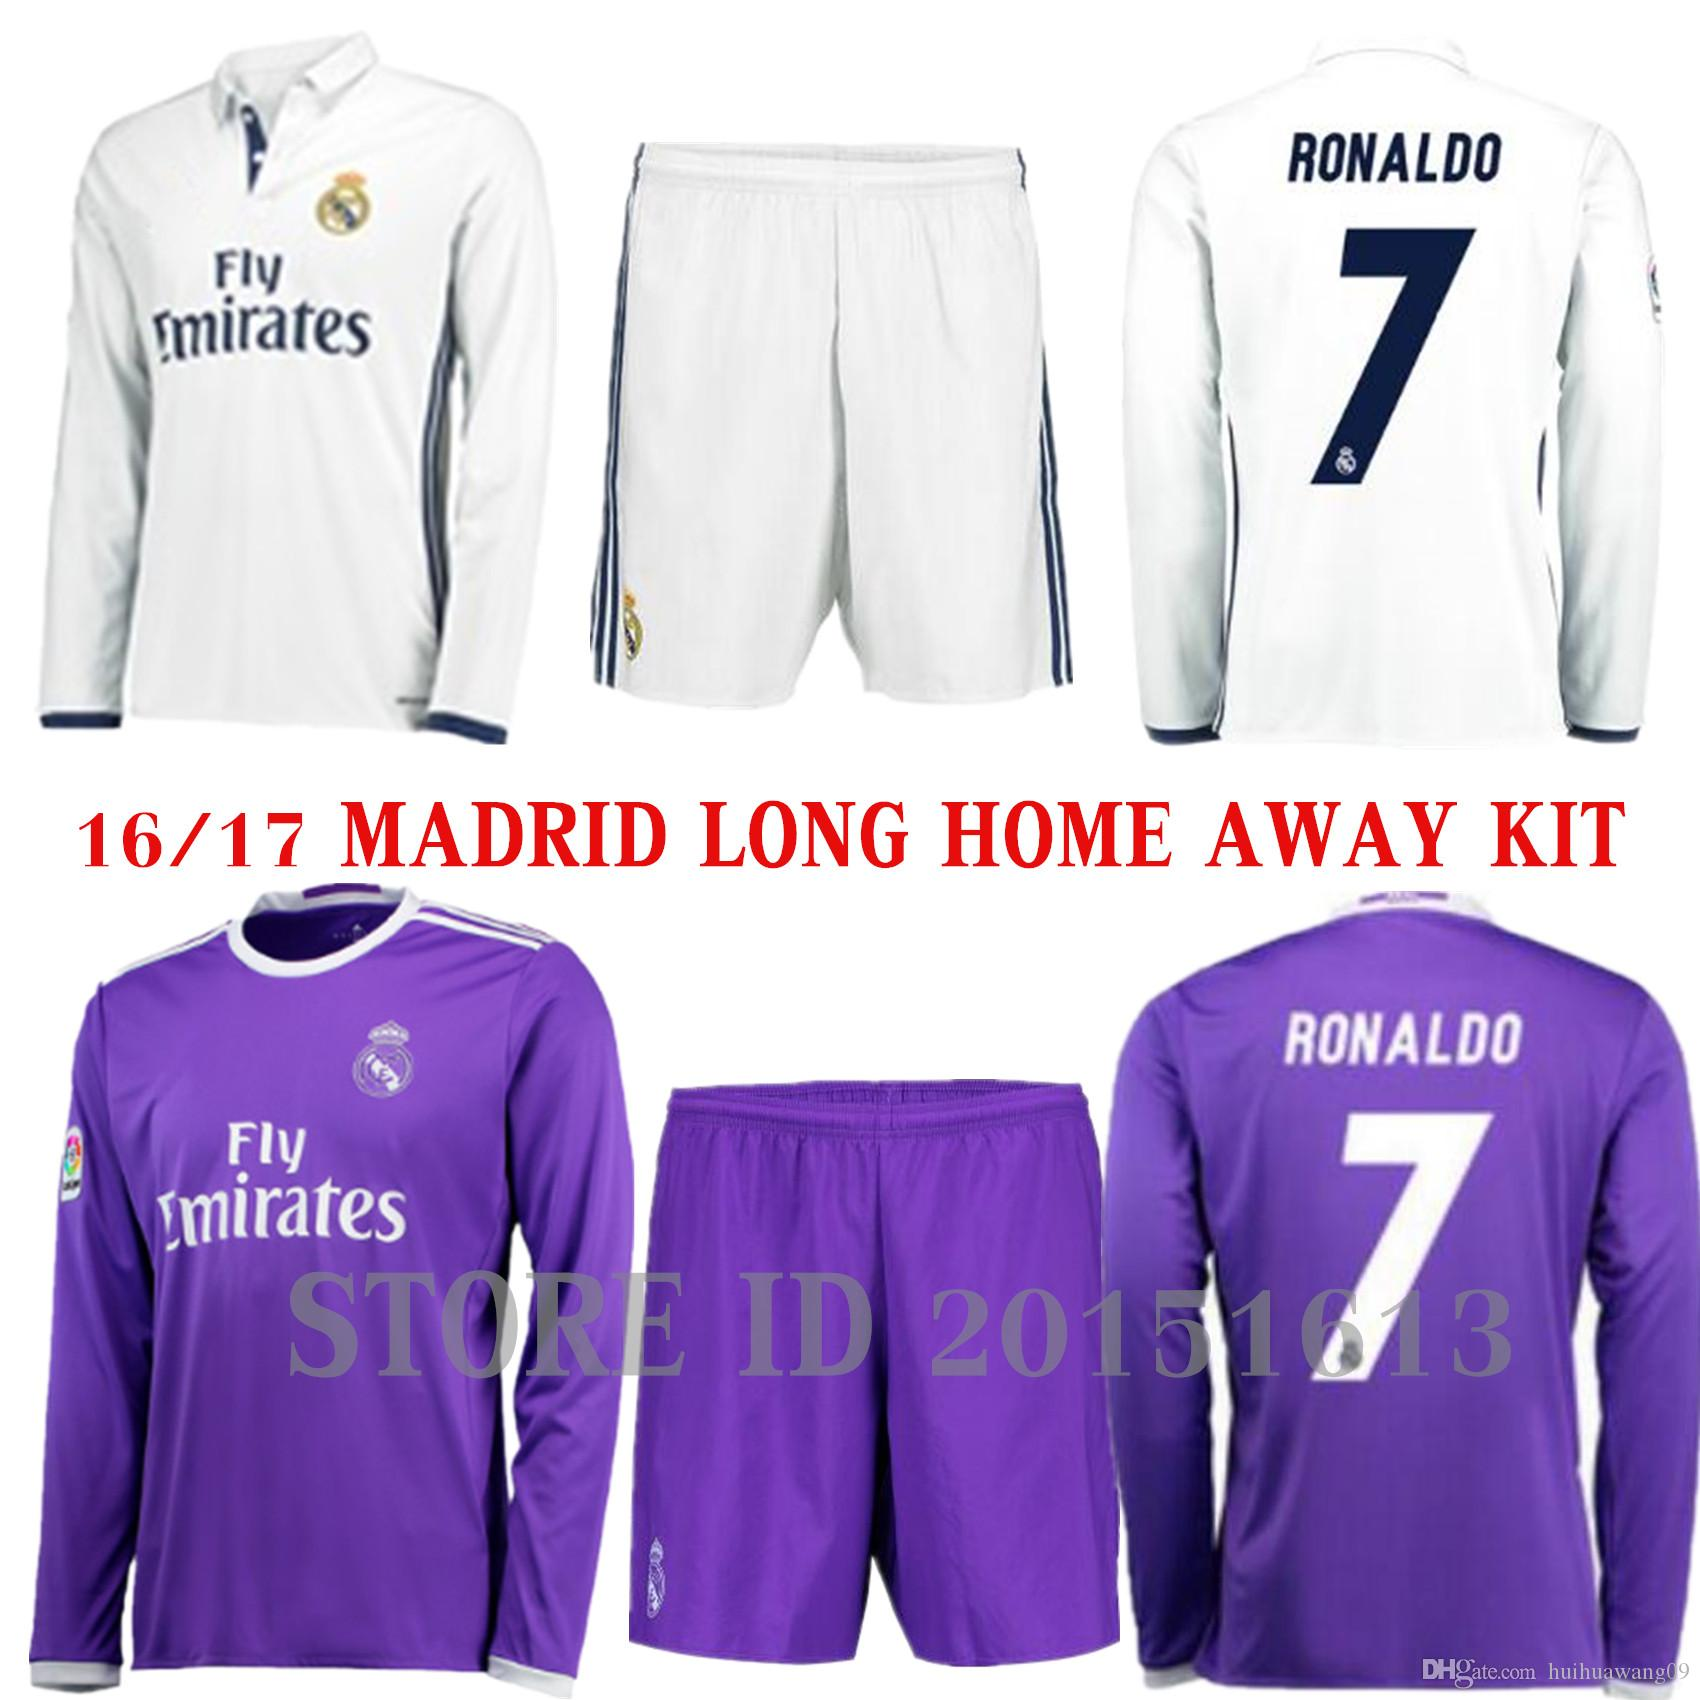 231d80244 ... 201617 Long Sleeve ReAL Madrid Jersey Kits Soccer Jerseys Sets Away  James Serigo Ramos Bale Real ...